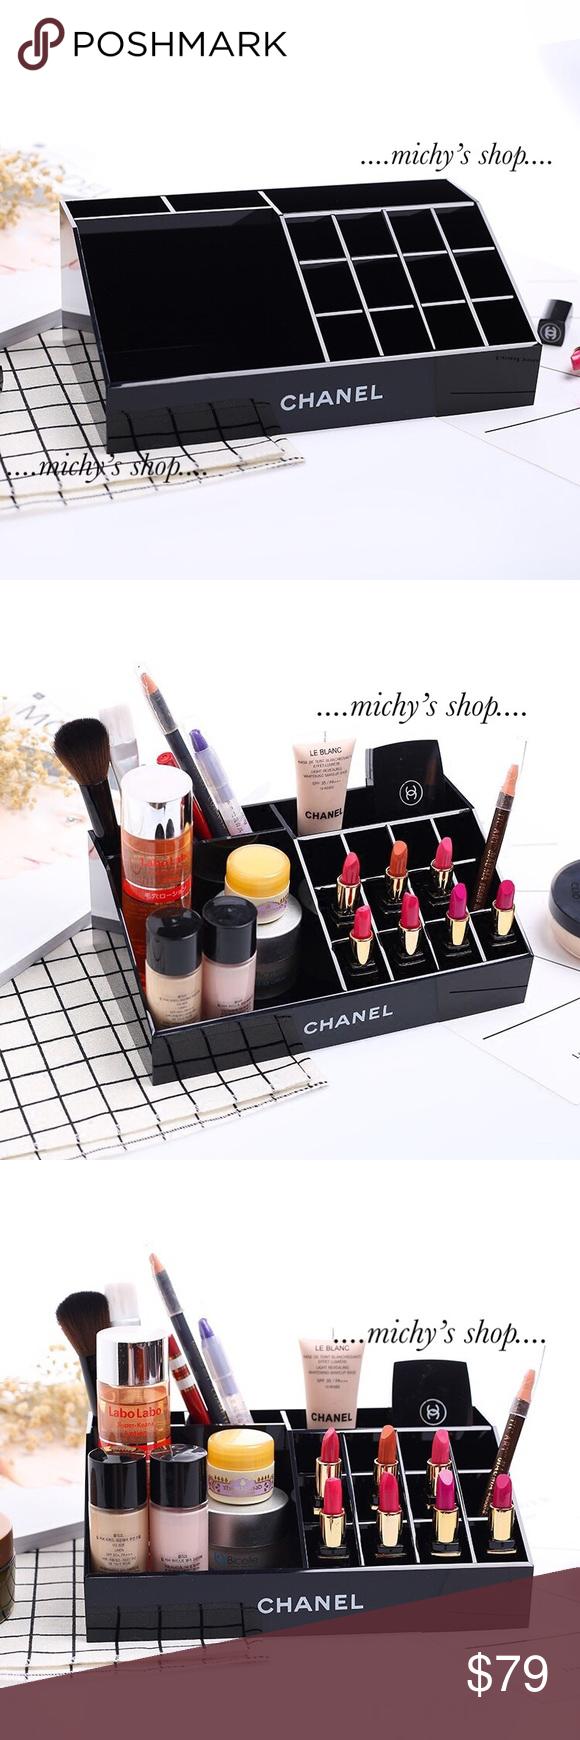 Chanel Brush lipstick makeup vanity box Organizer CHANEL